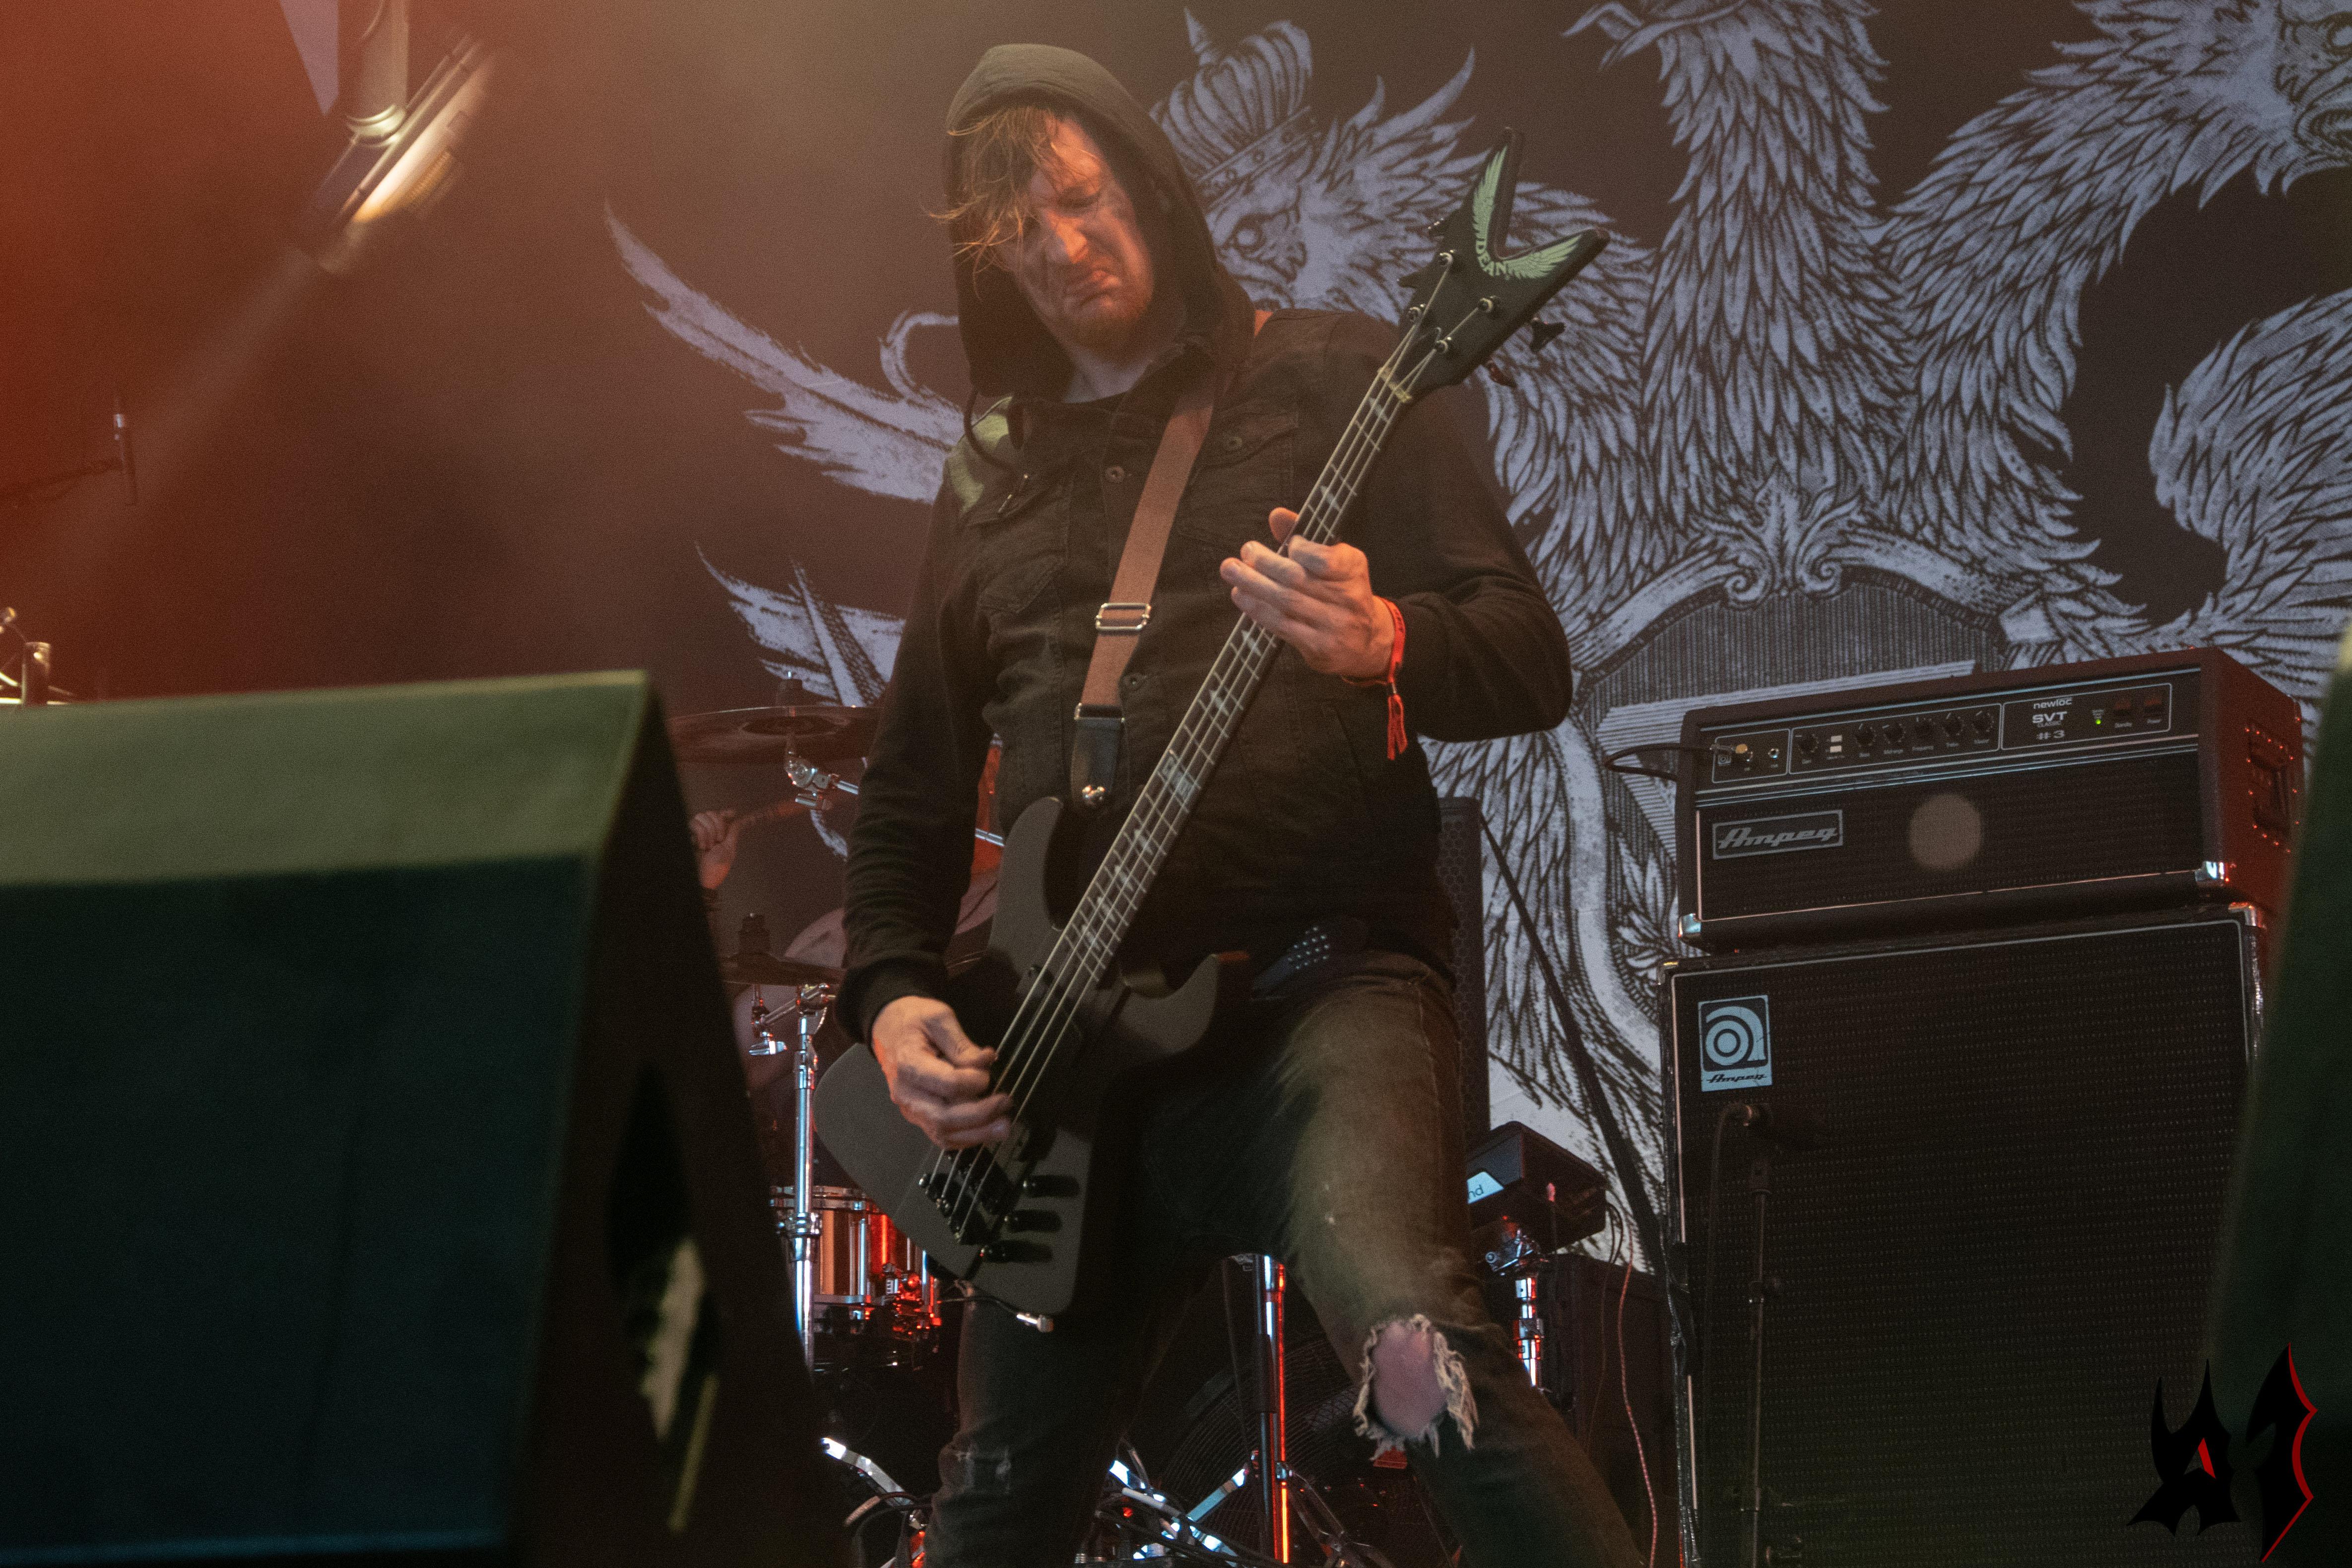 Hellfest - Vltimas - 14